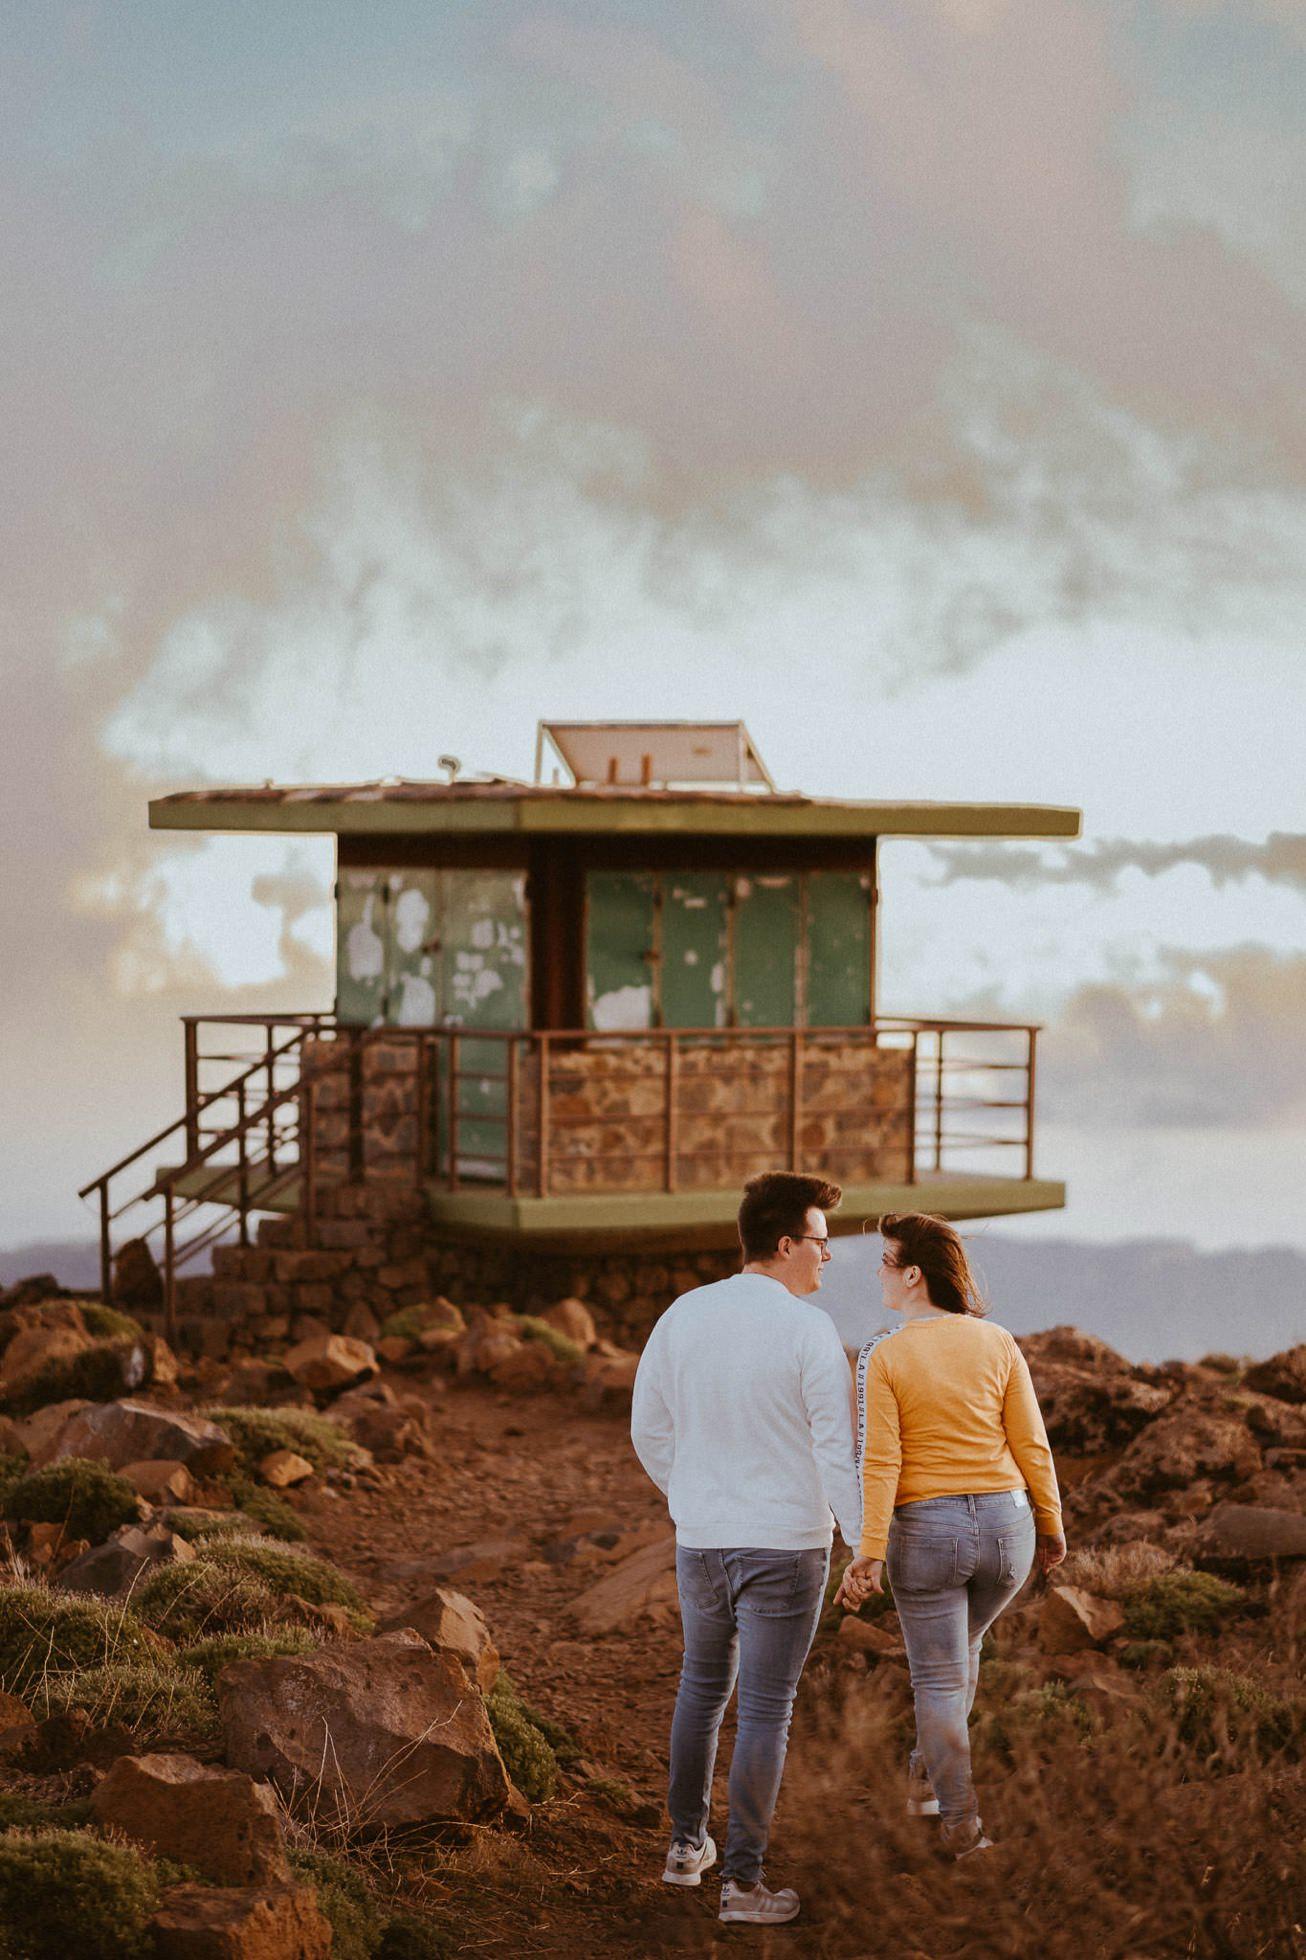 Canary islands Pico Nieves Gran Canaria Photographer 8